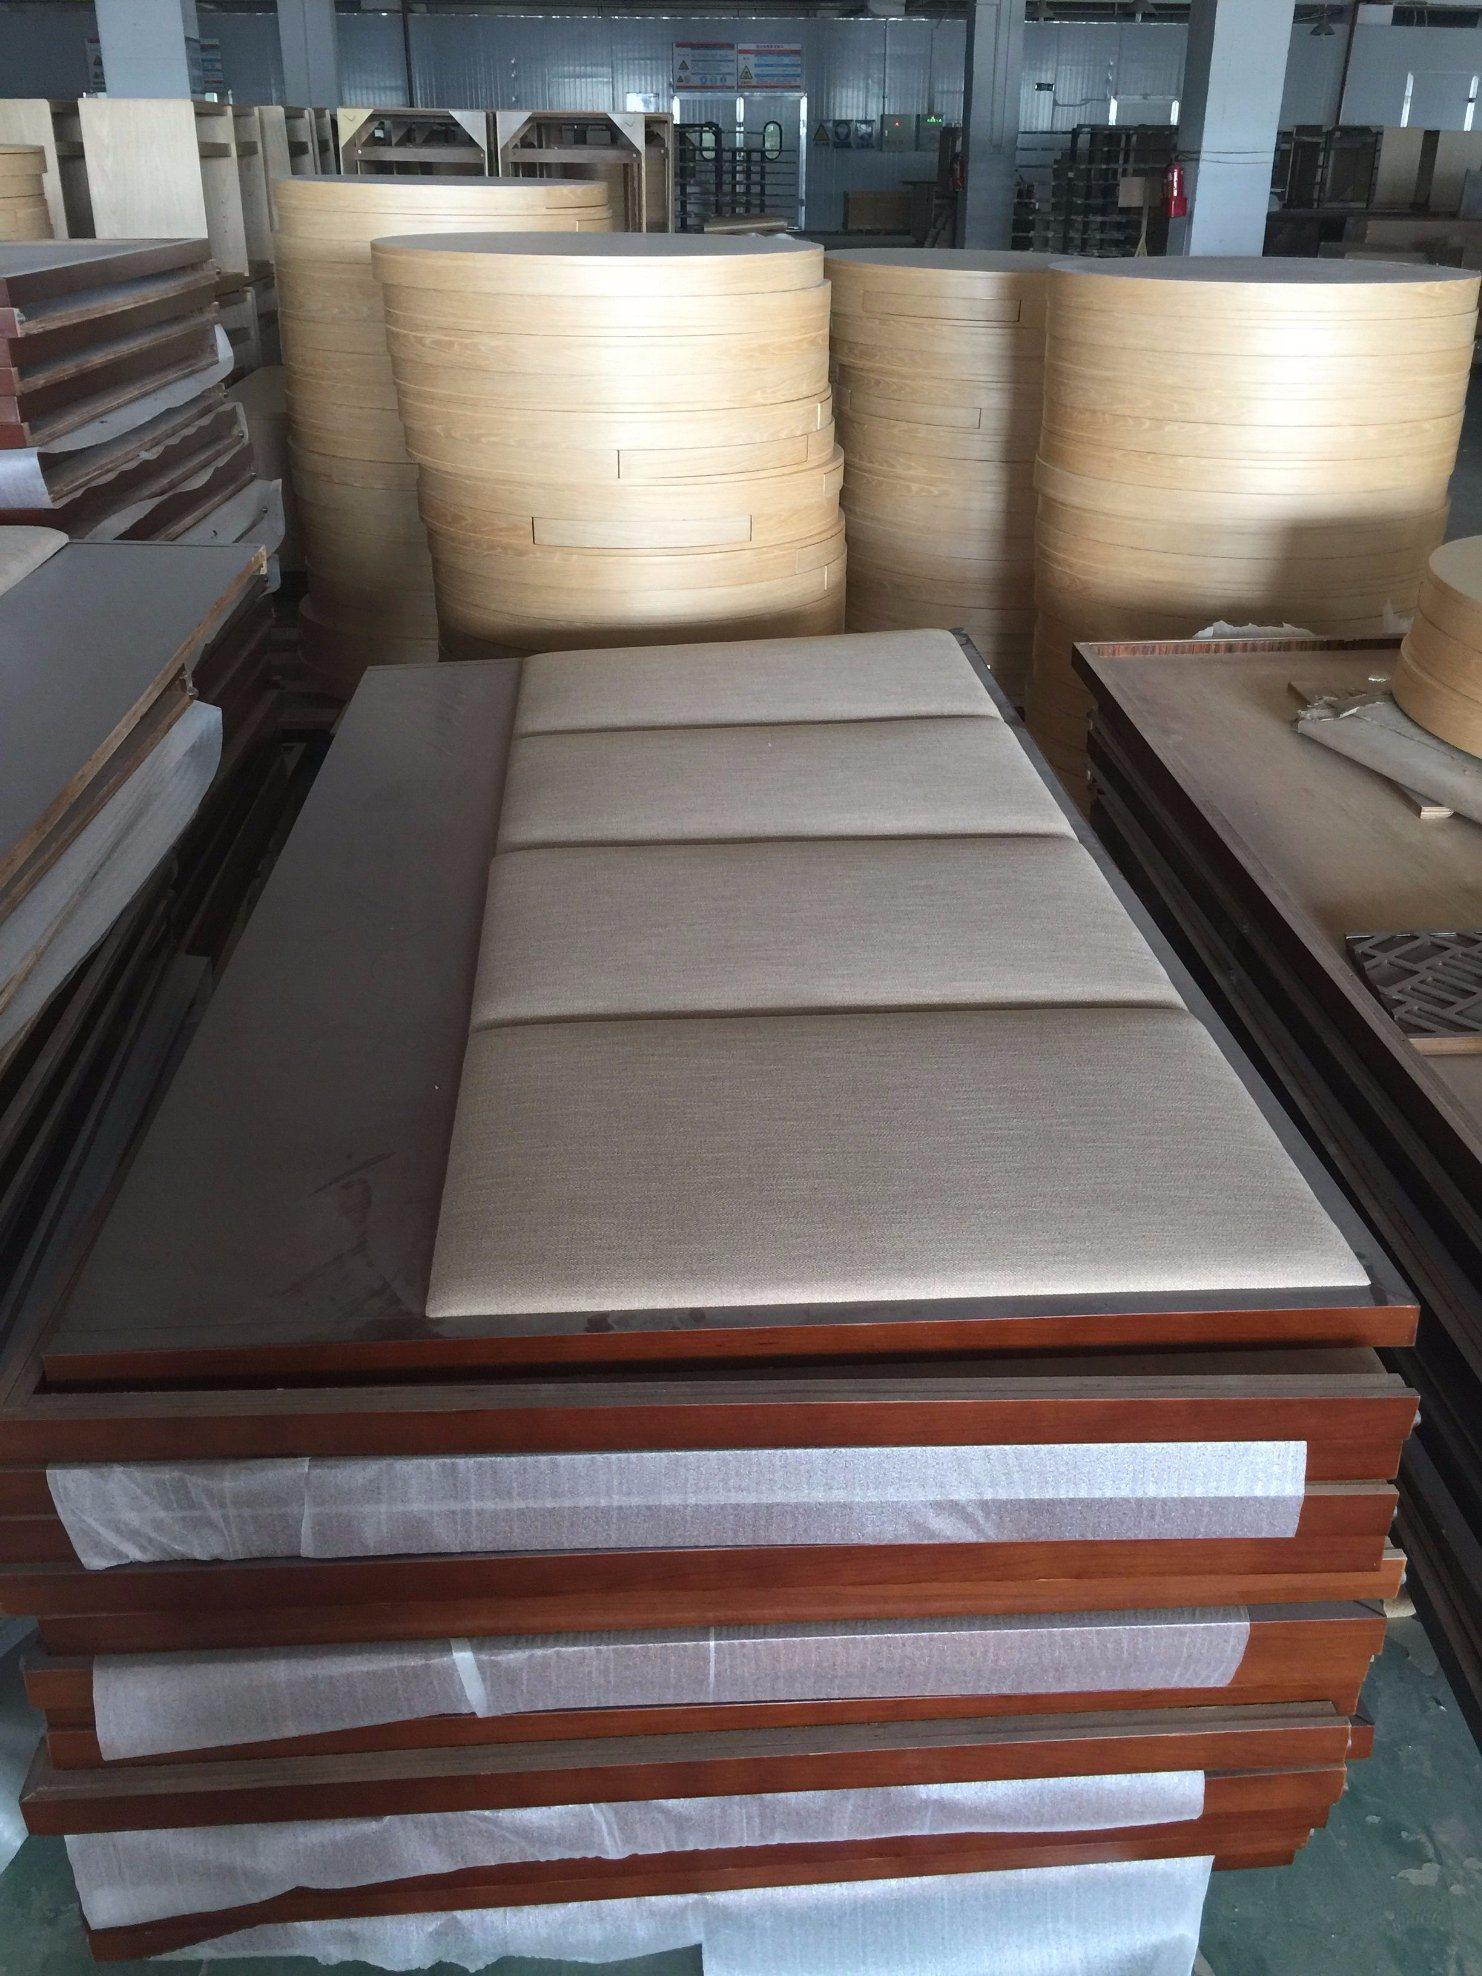 Hotel Furniture/Luxury Double Bedroom Furniture/Standard Hotel Double Bedroom Suite/Double Hospitality Guest Room Furniture (GLB-0109845)